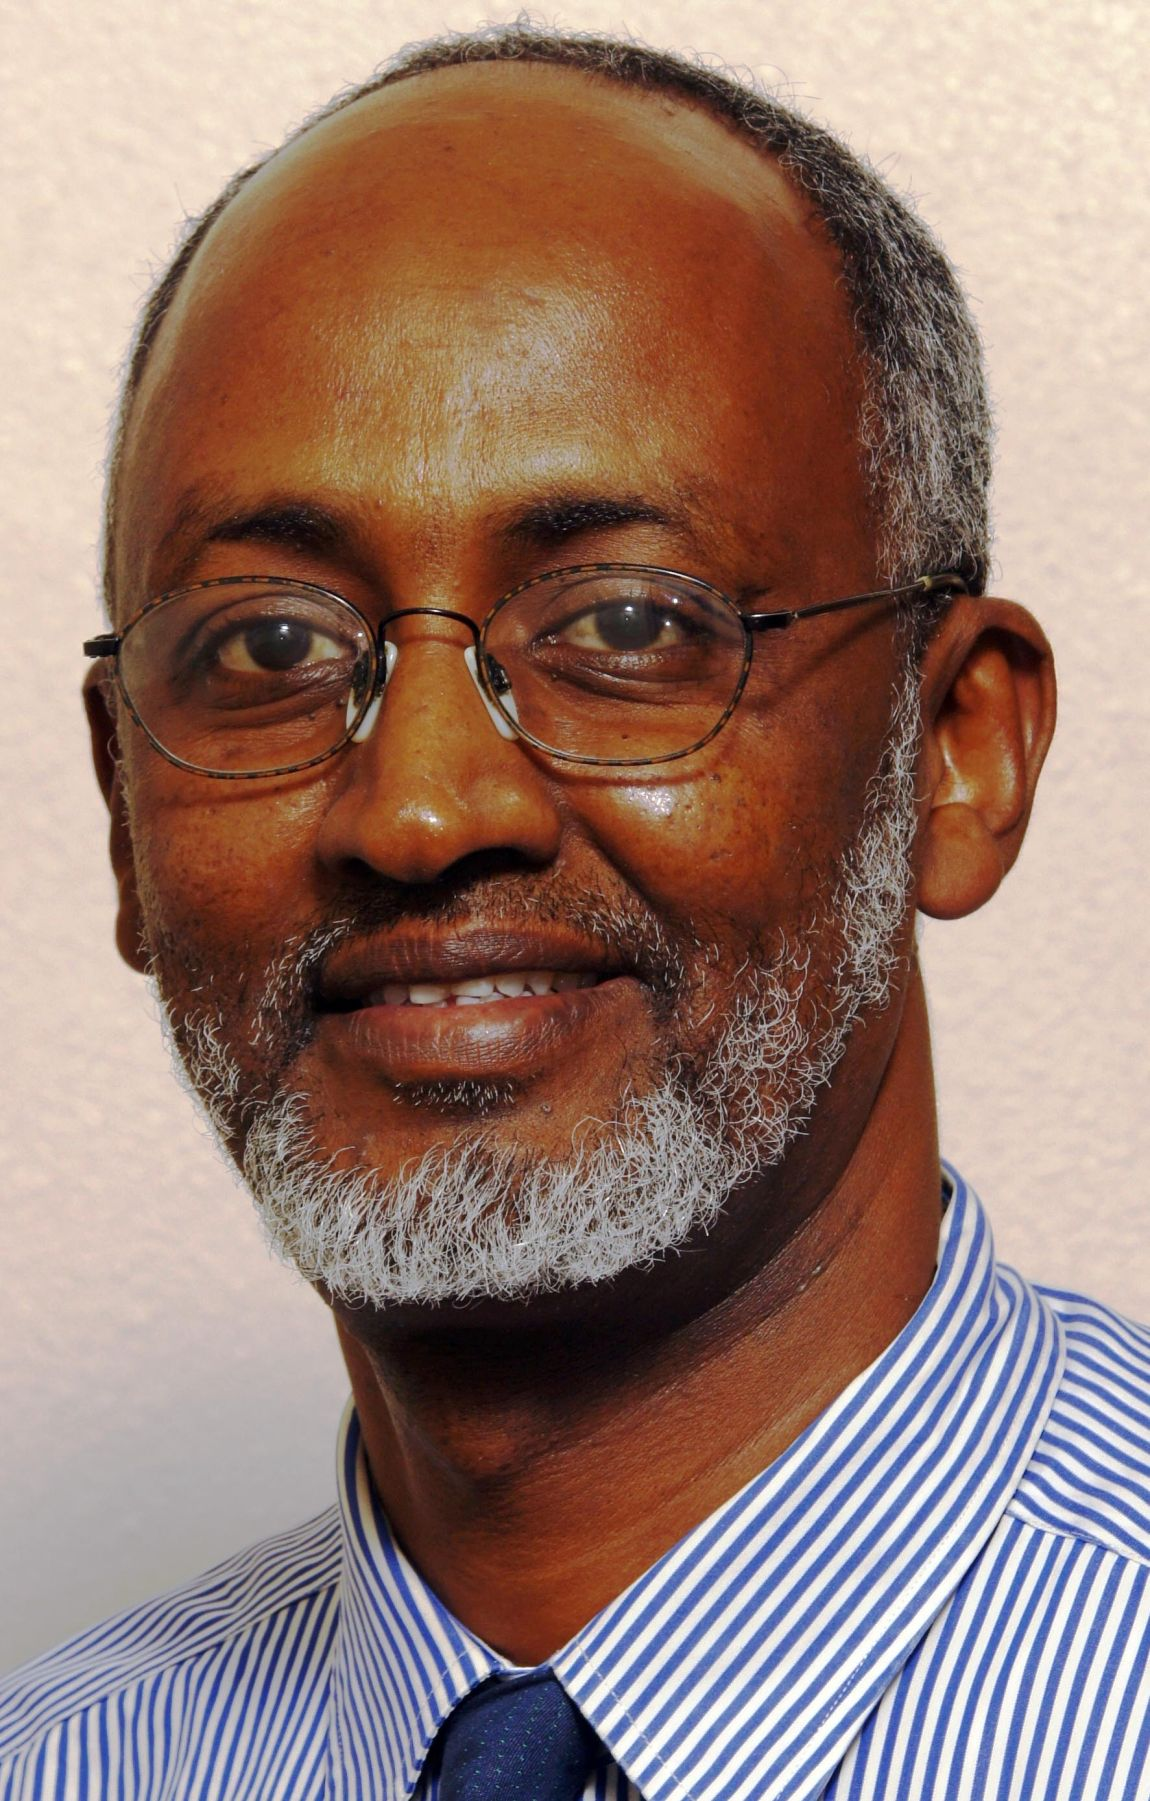 Abdi Sabrie